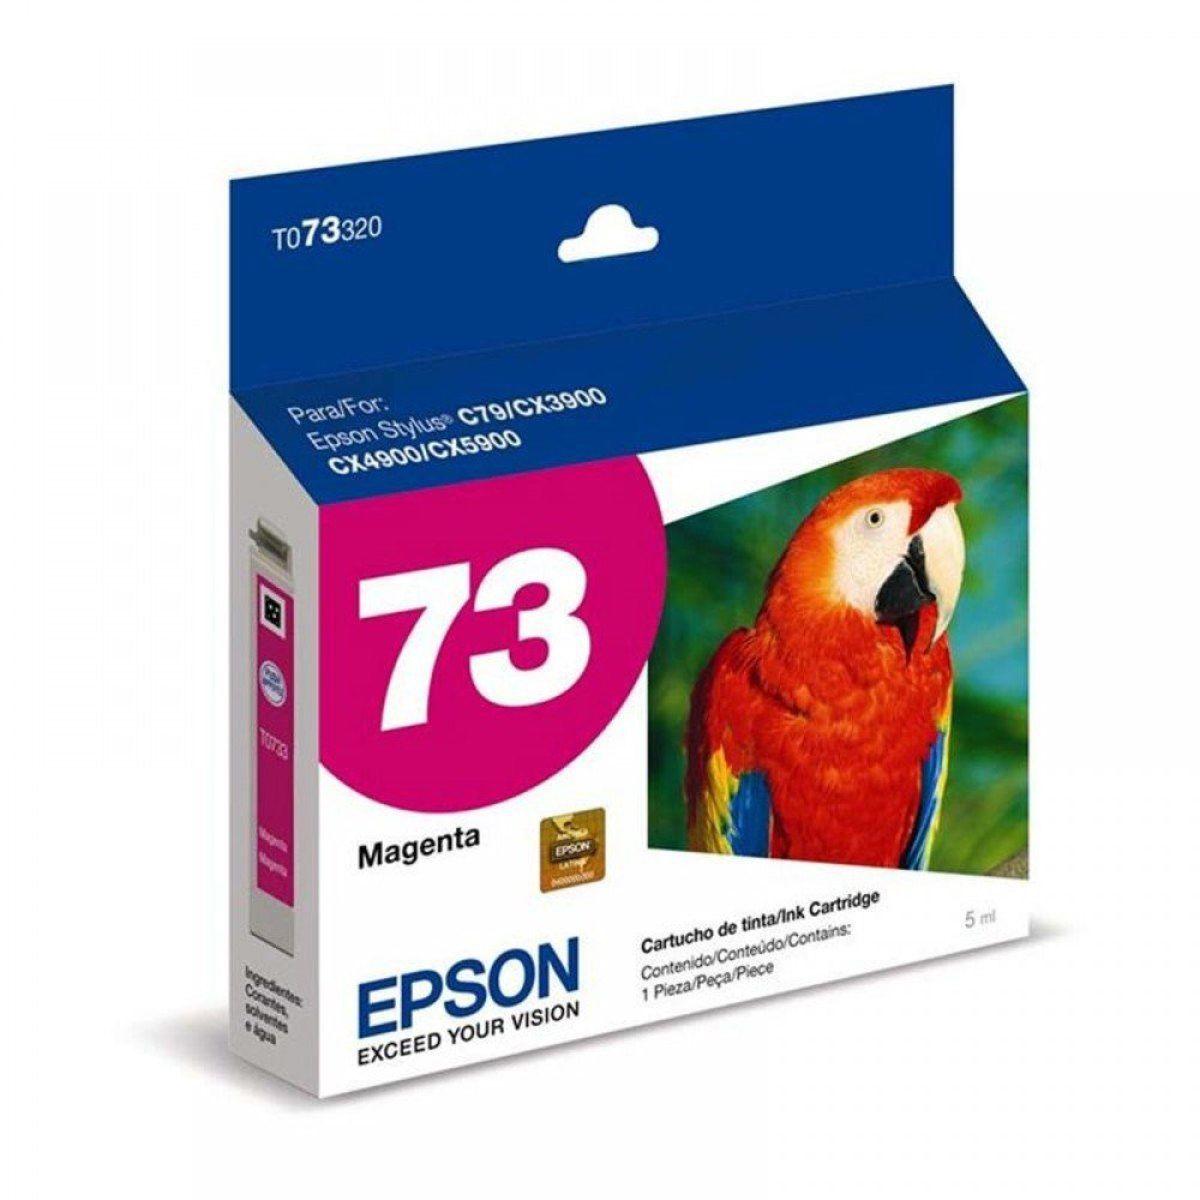 CARTUCHO 73 T073220 CIAN EPSON